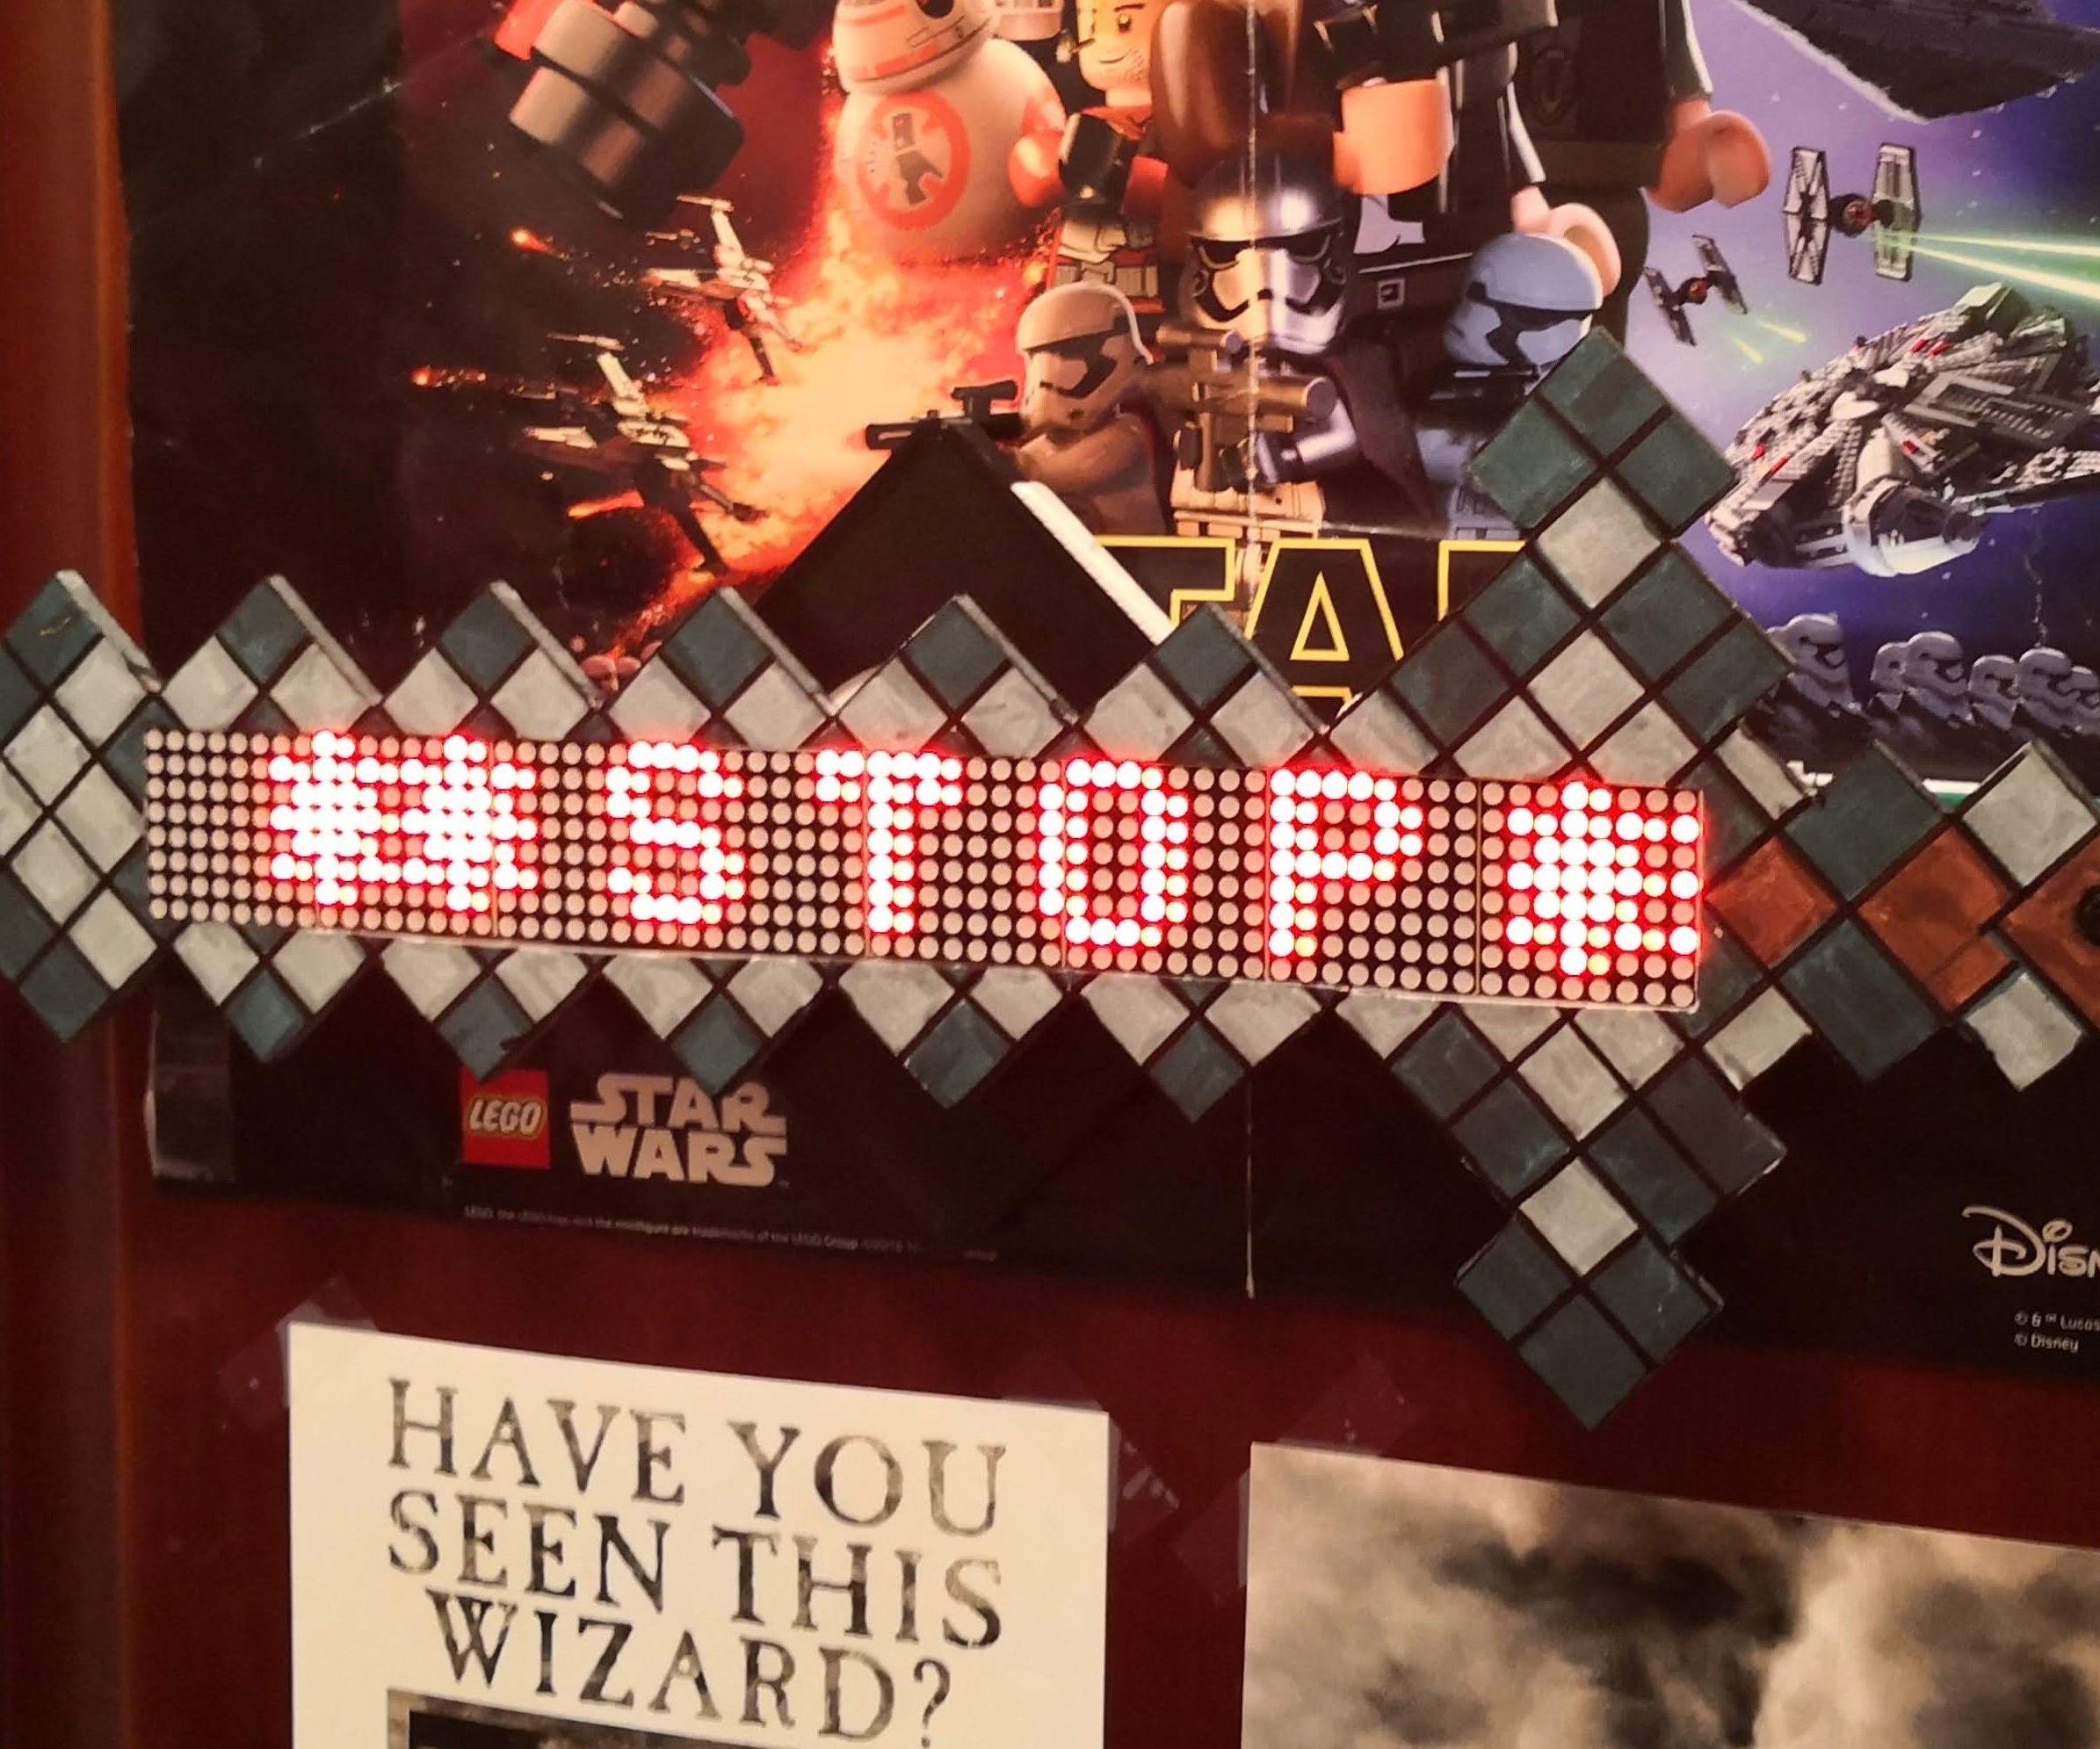 Interactive Minecraft Do Not Enter Sword/Sign (ESP32-CAM)